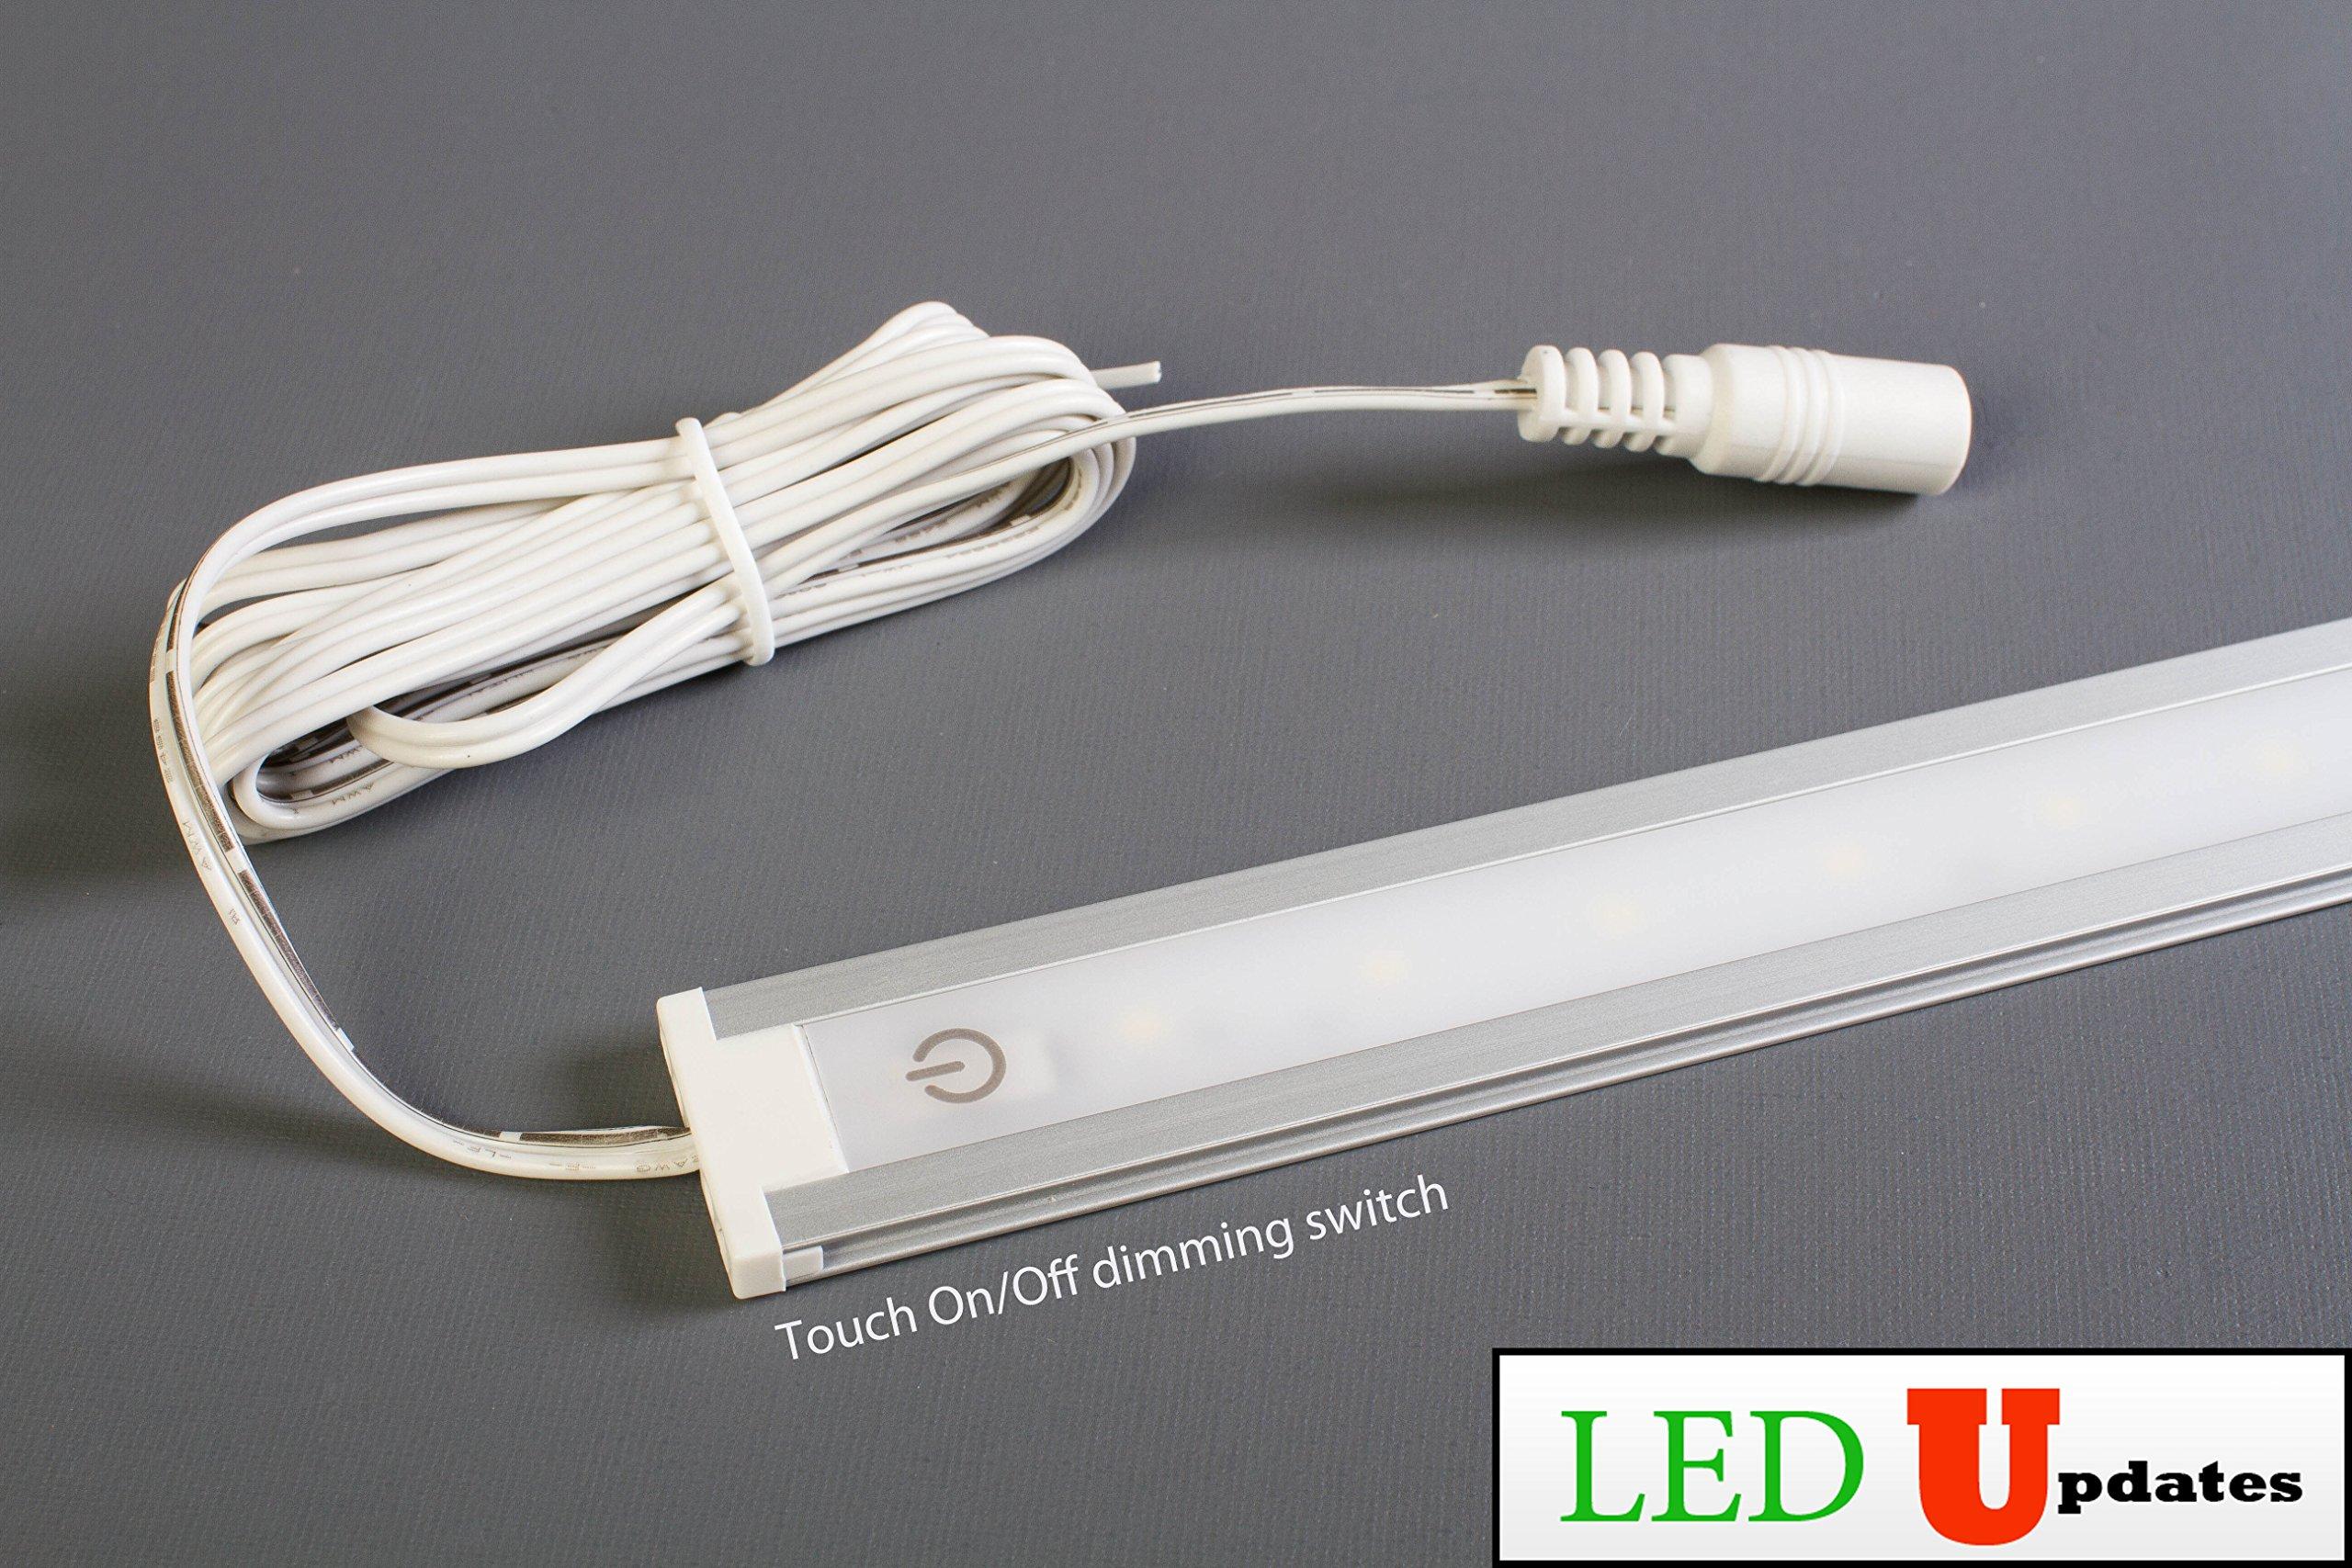 LEDupdates 24 inches Under Cabinet LED light for work shop & closet with UL Power adapter by LEDUPDATES (Image #2)